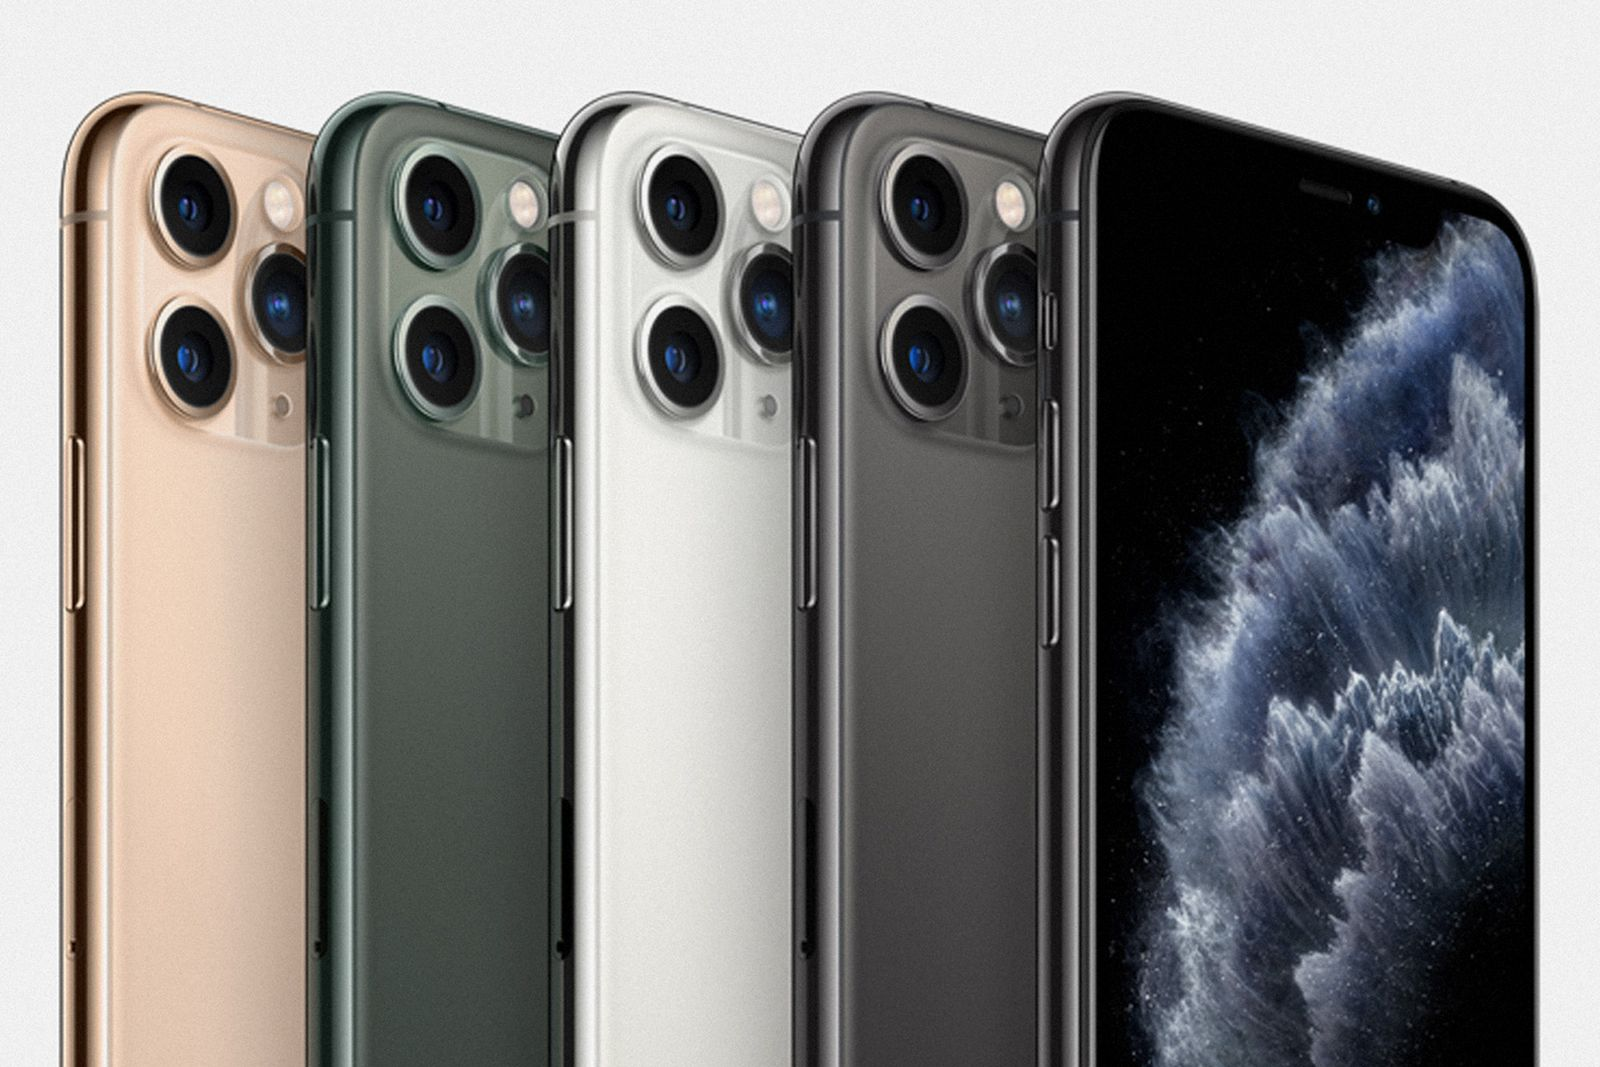 Iphone 12 Mini Rumors Tease Apple S Smallest New Model